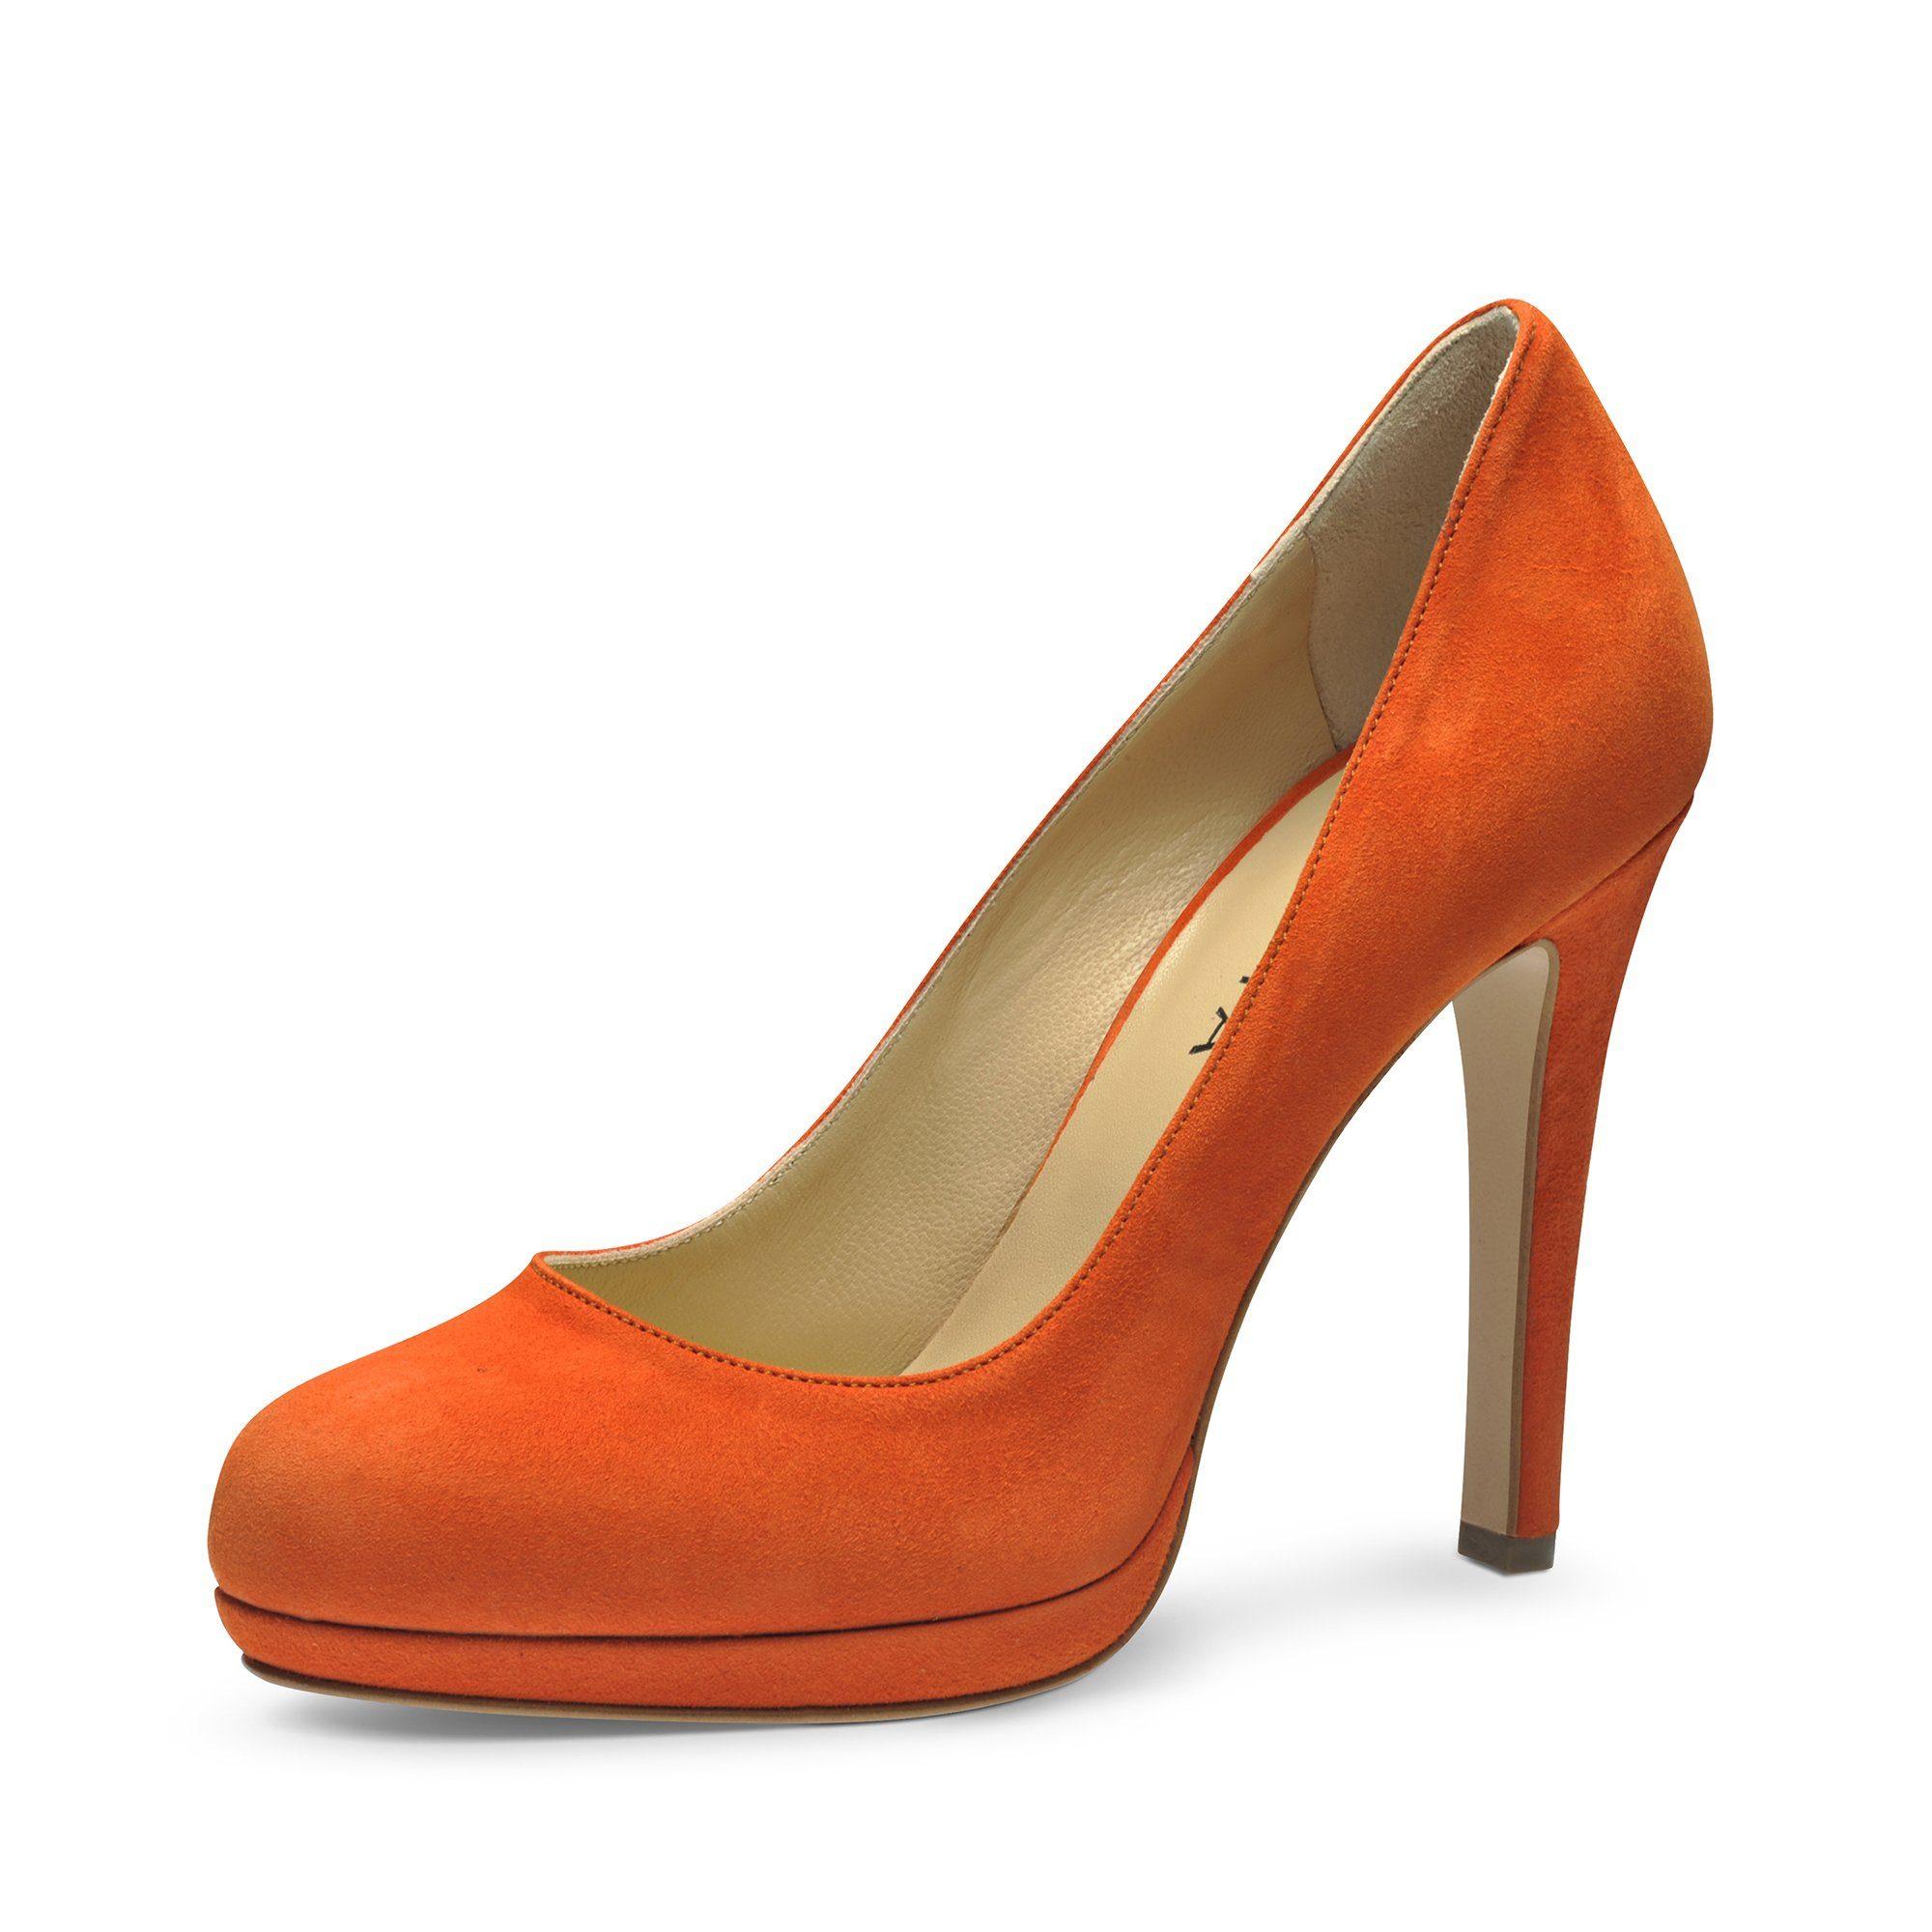 Evita CRISTINA Pumps online kaufen  orange